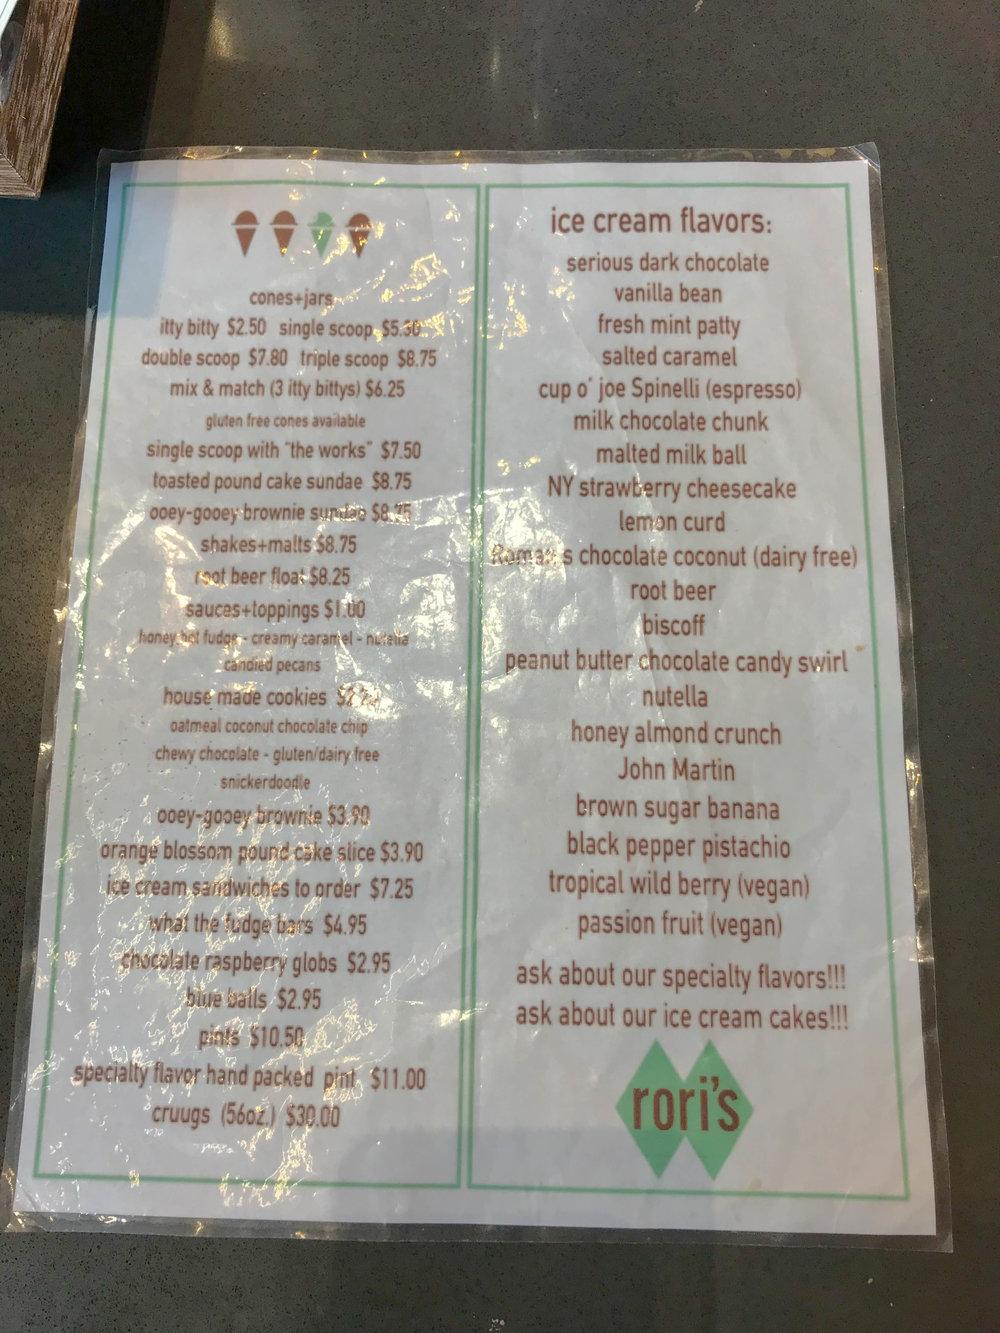 Rori's Artisinal Creamery - Ice Cream Menu